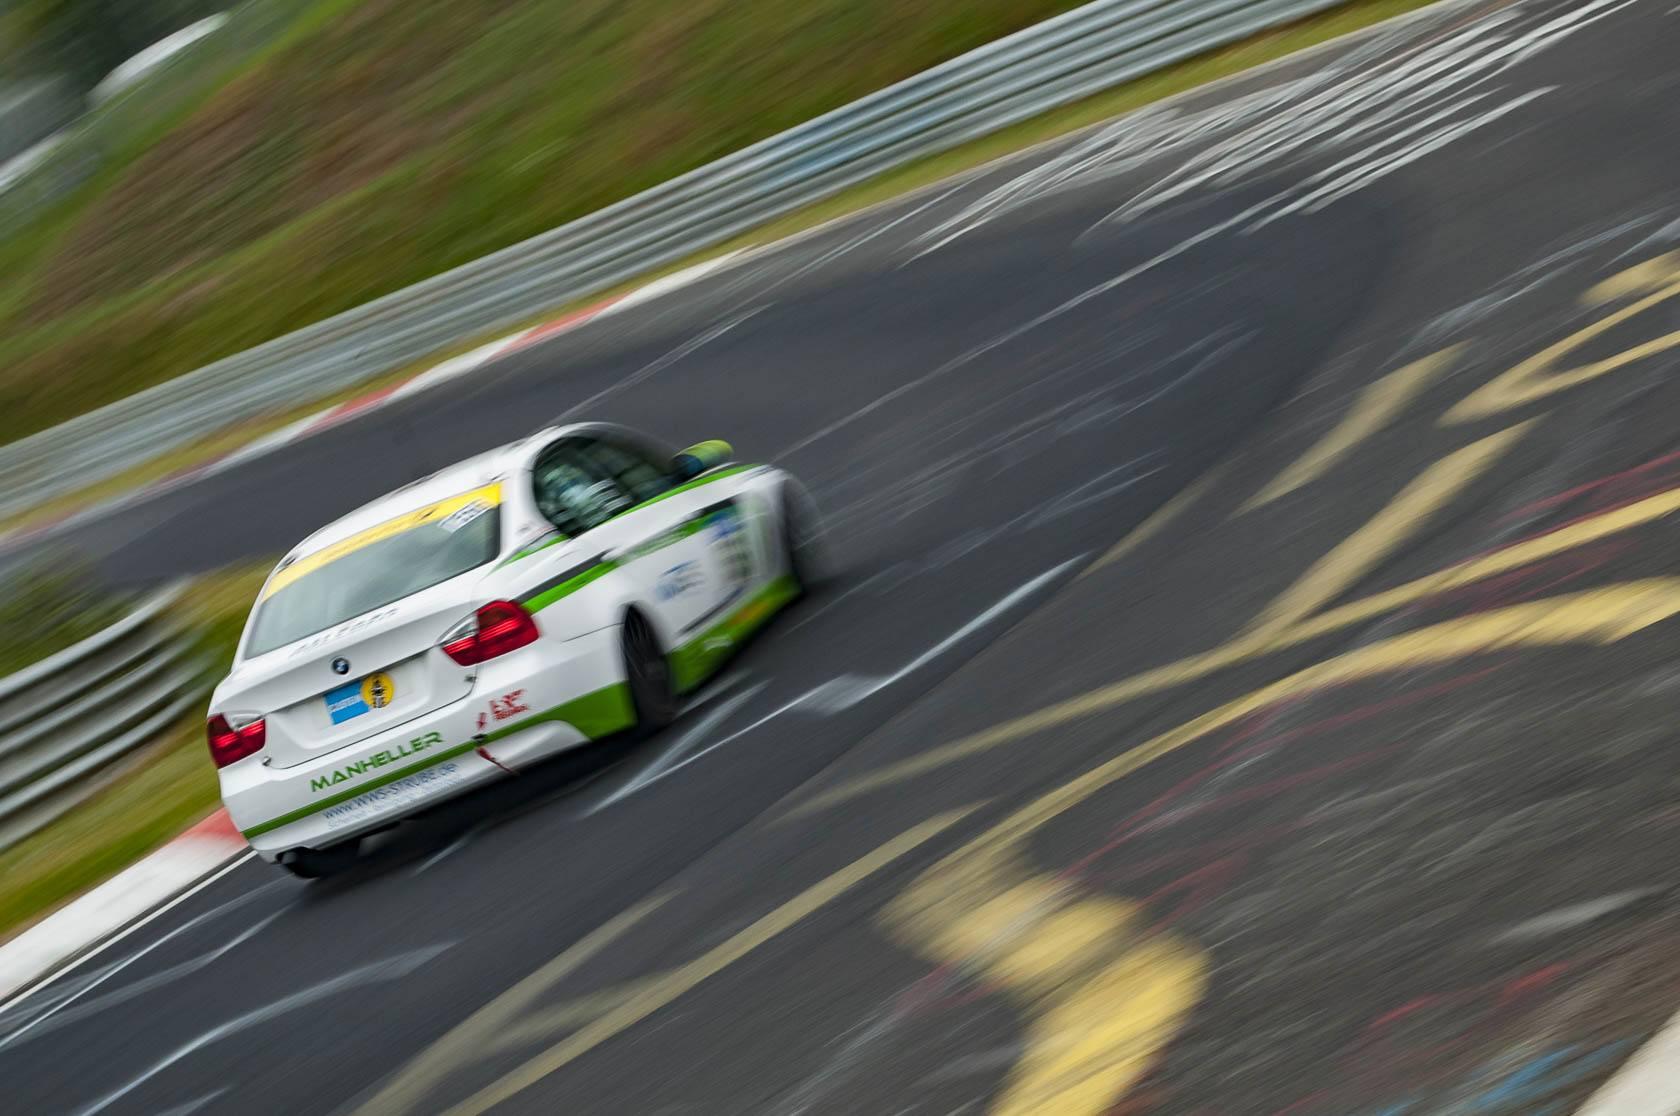 Manheller Racing N24h 24h-Rennen Nürburgring 2018